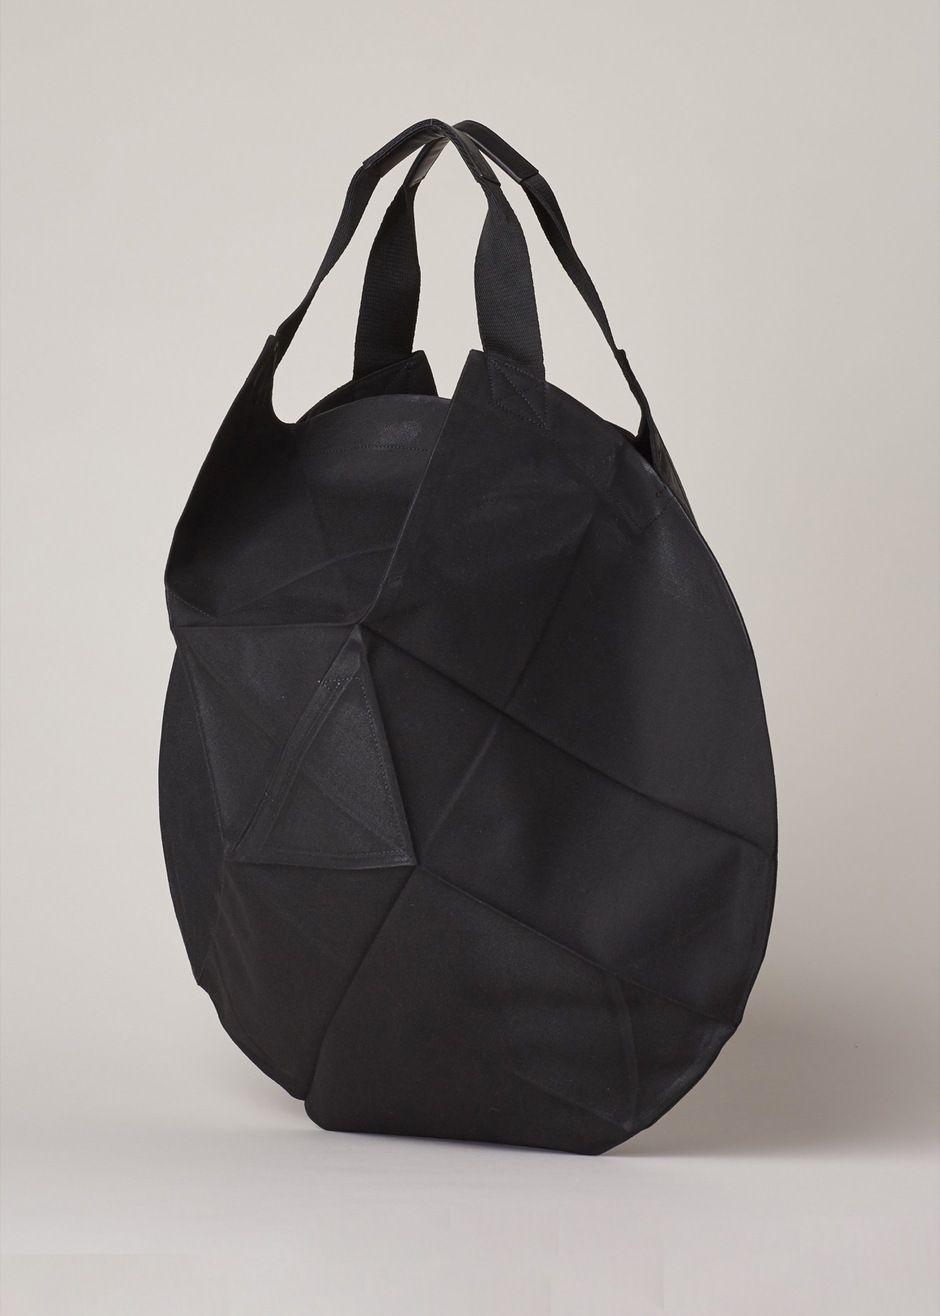 27a404388a Yohji Yamamoto Slouch Backpack - Henrik Vibskov Boutique - Farfetch.com